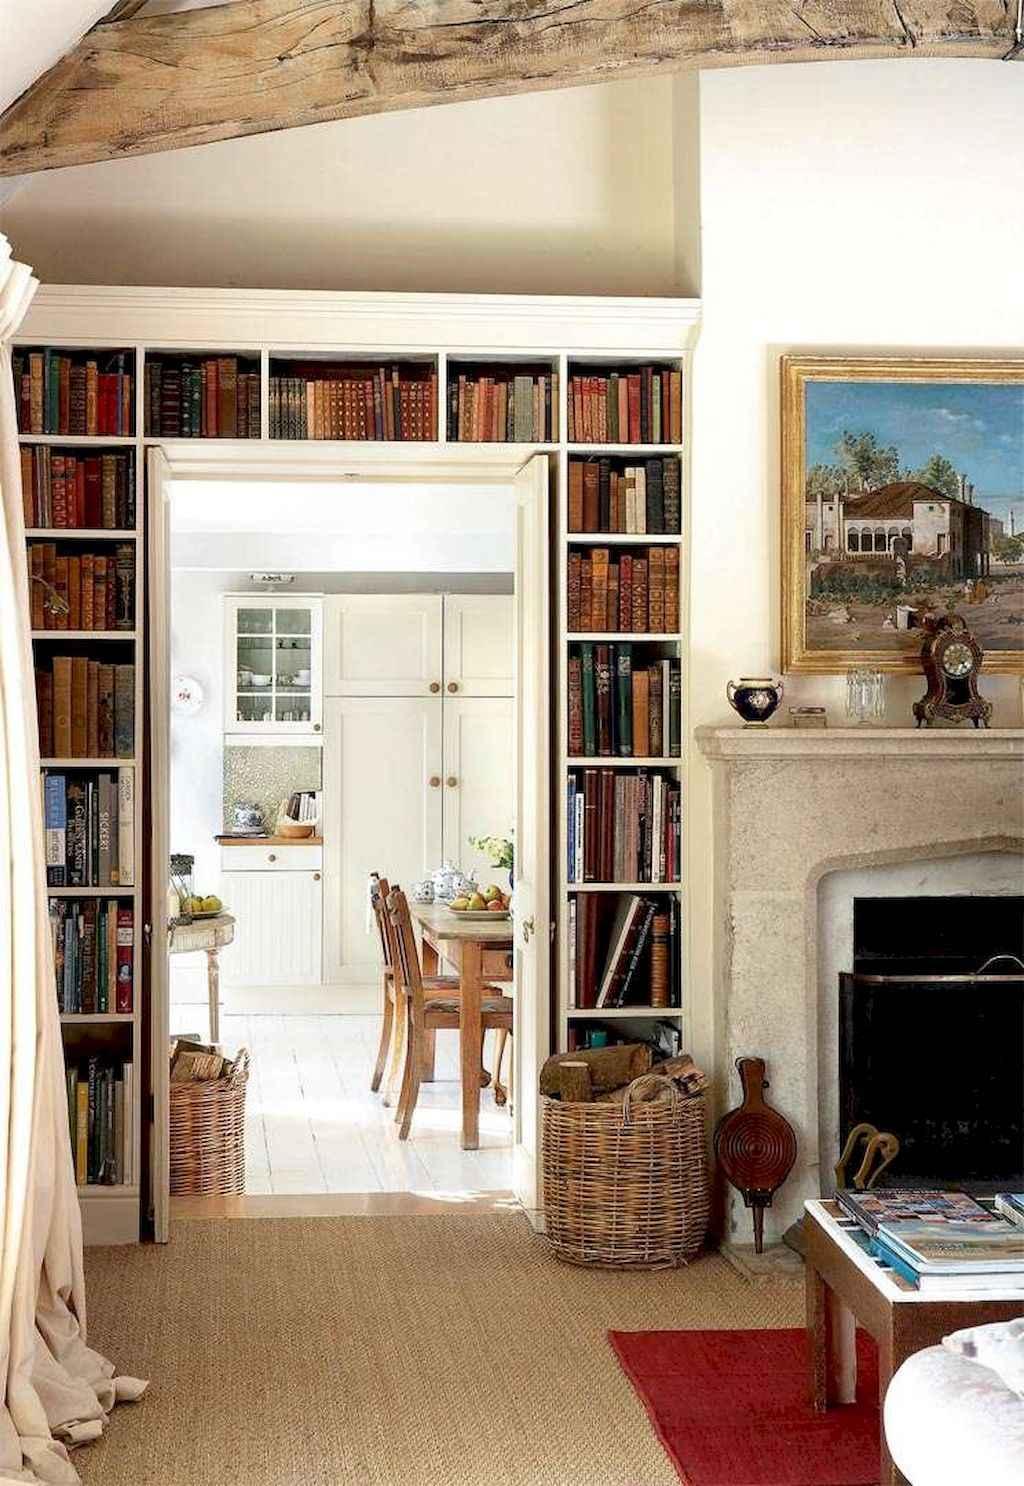 Simple clean vintage living room decorating ideas (1)